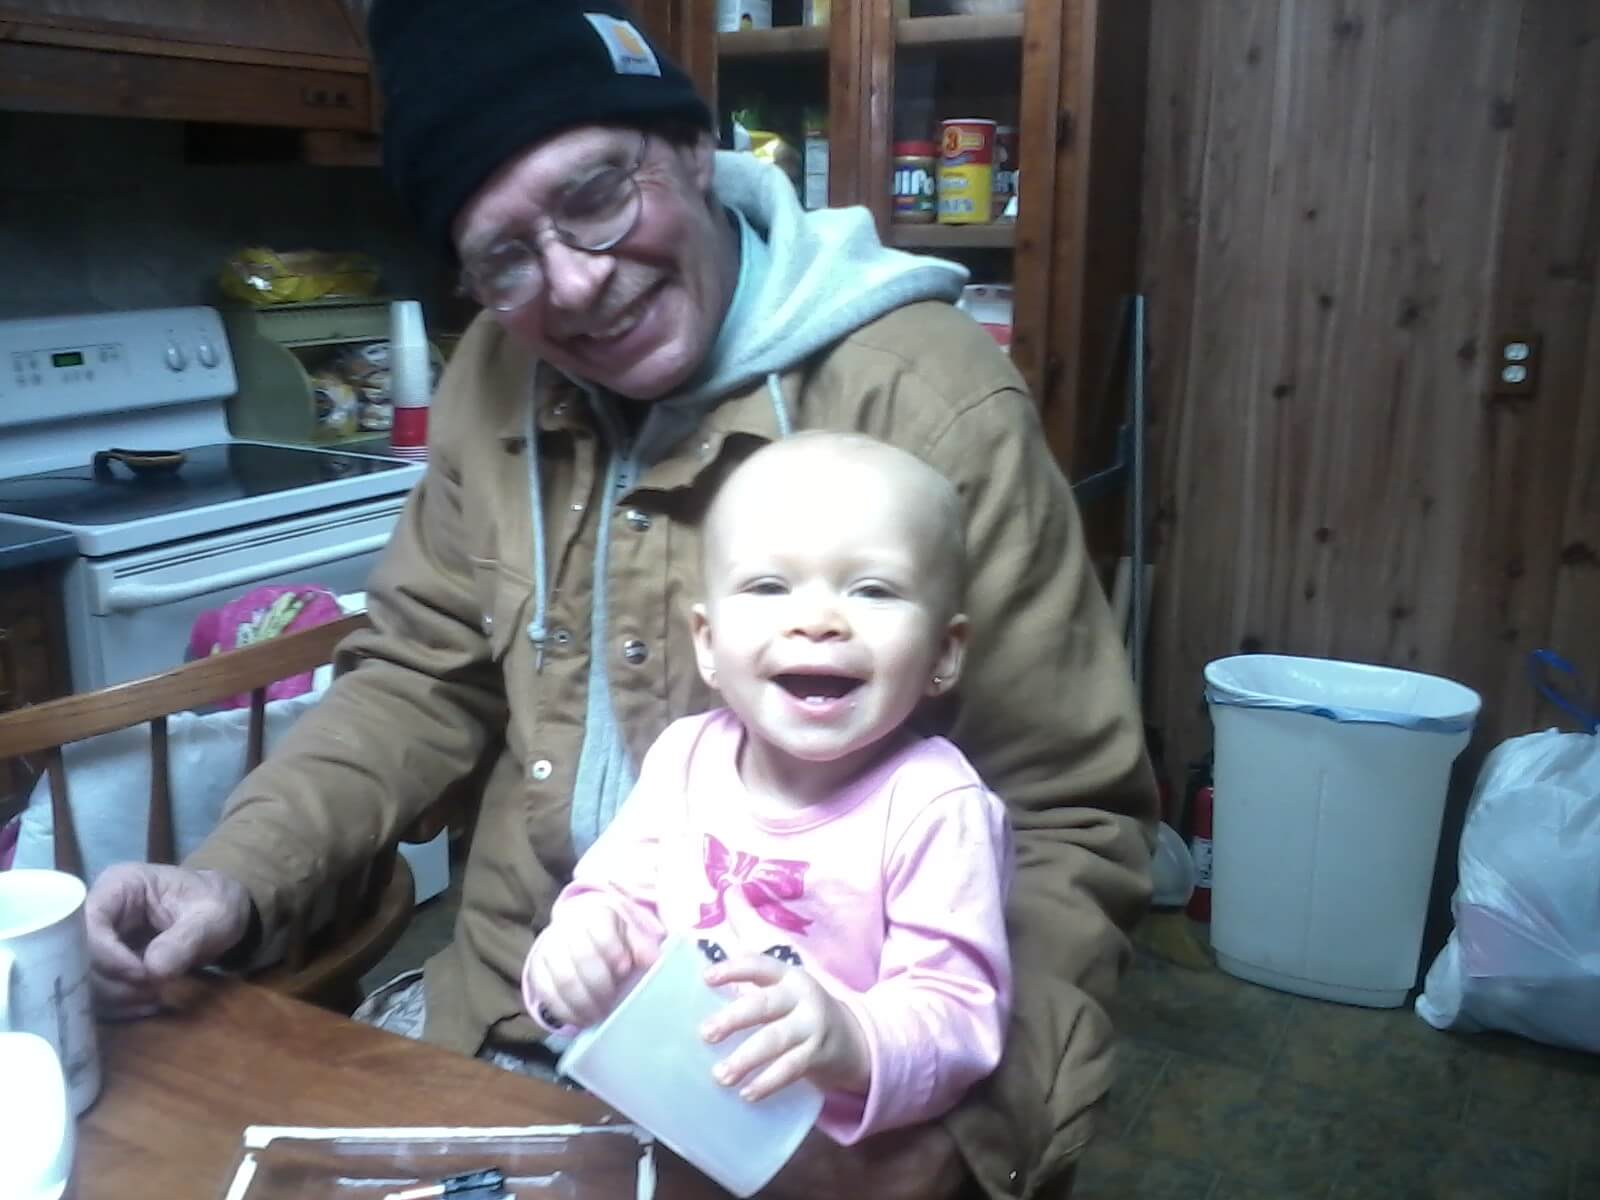 Richard Harveston with his granddaughter following his surgeries.